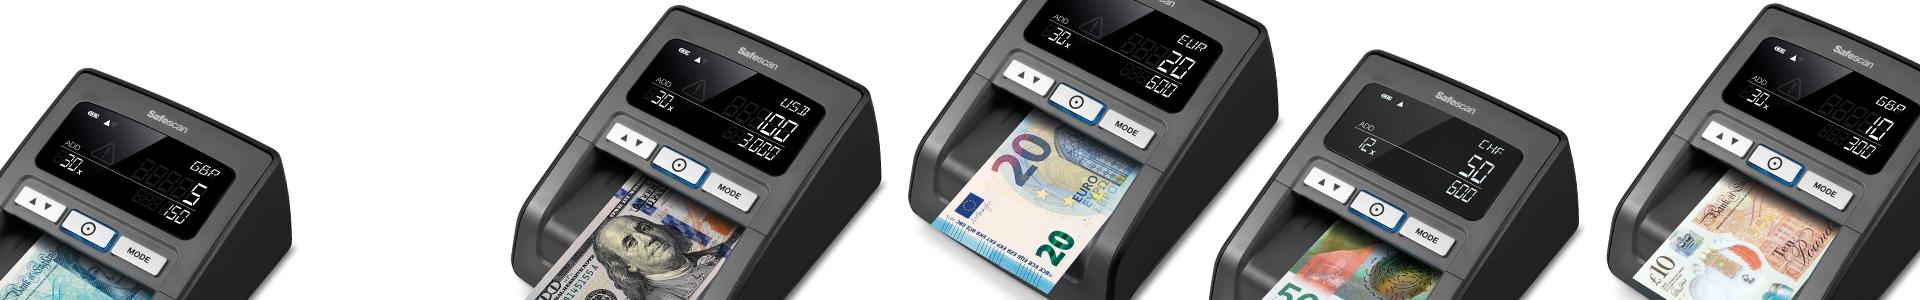 Counterfeit Detectors 3